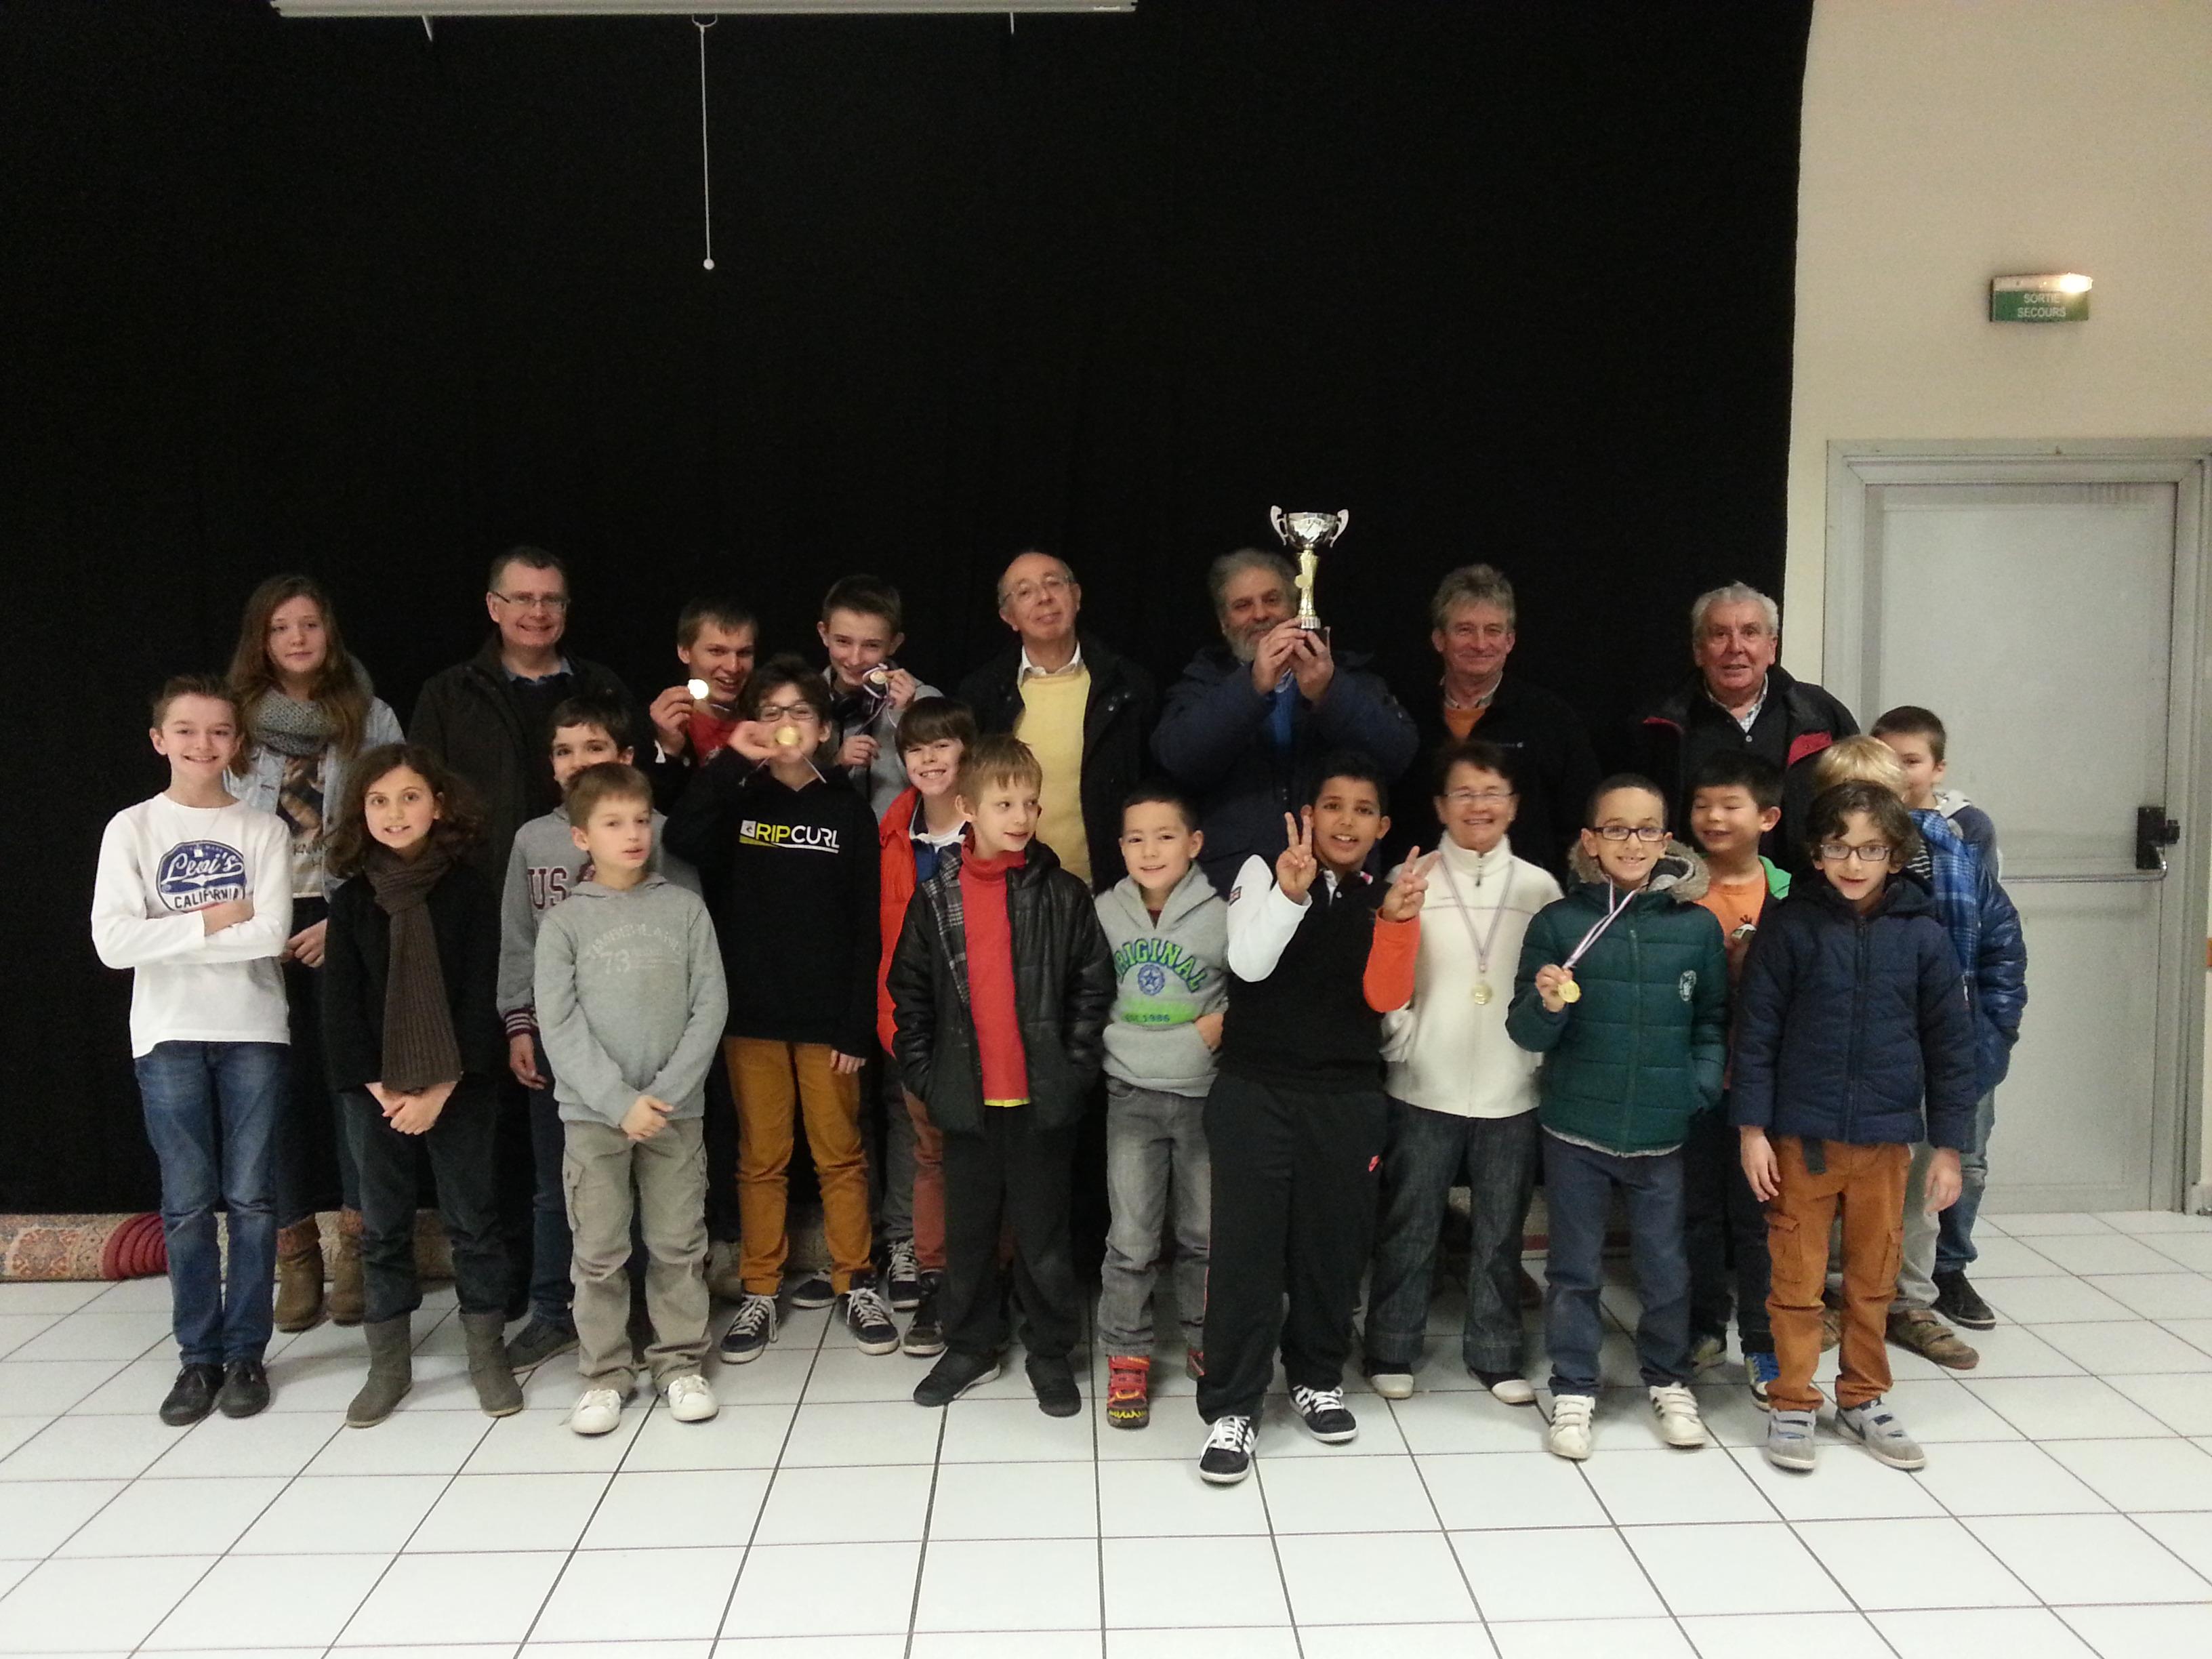 tournoi-interne-6-decembre-2014-academie-echecs-philidor-9